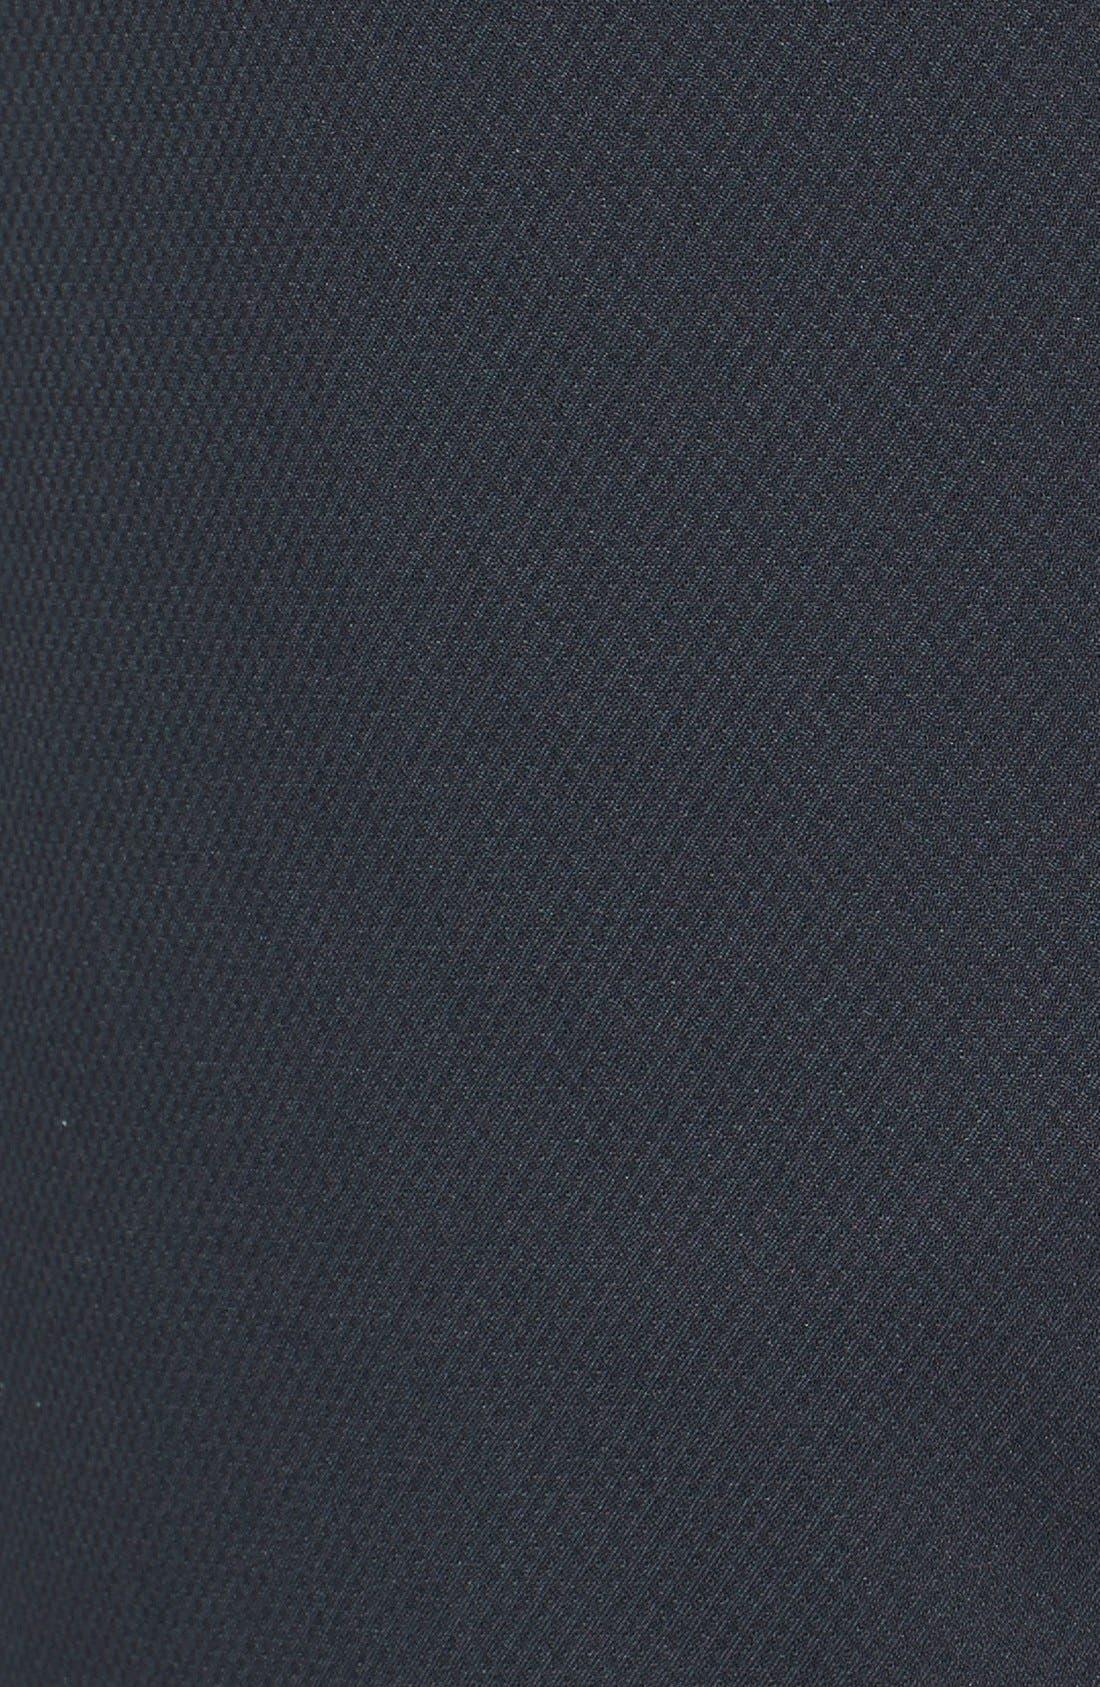 'Yogger' Shorts,                             Alternate thumbnail 2, color,                             001